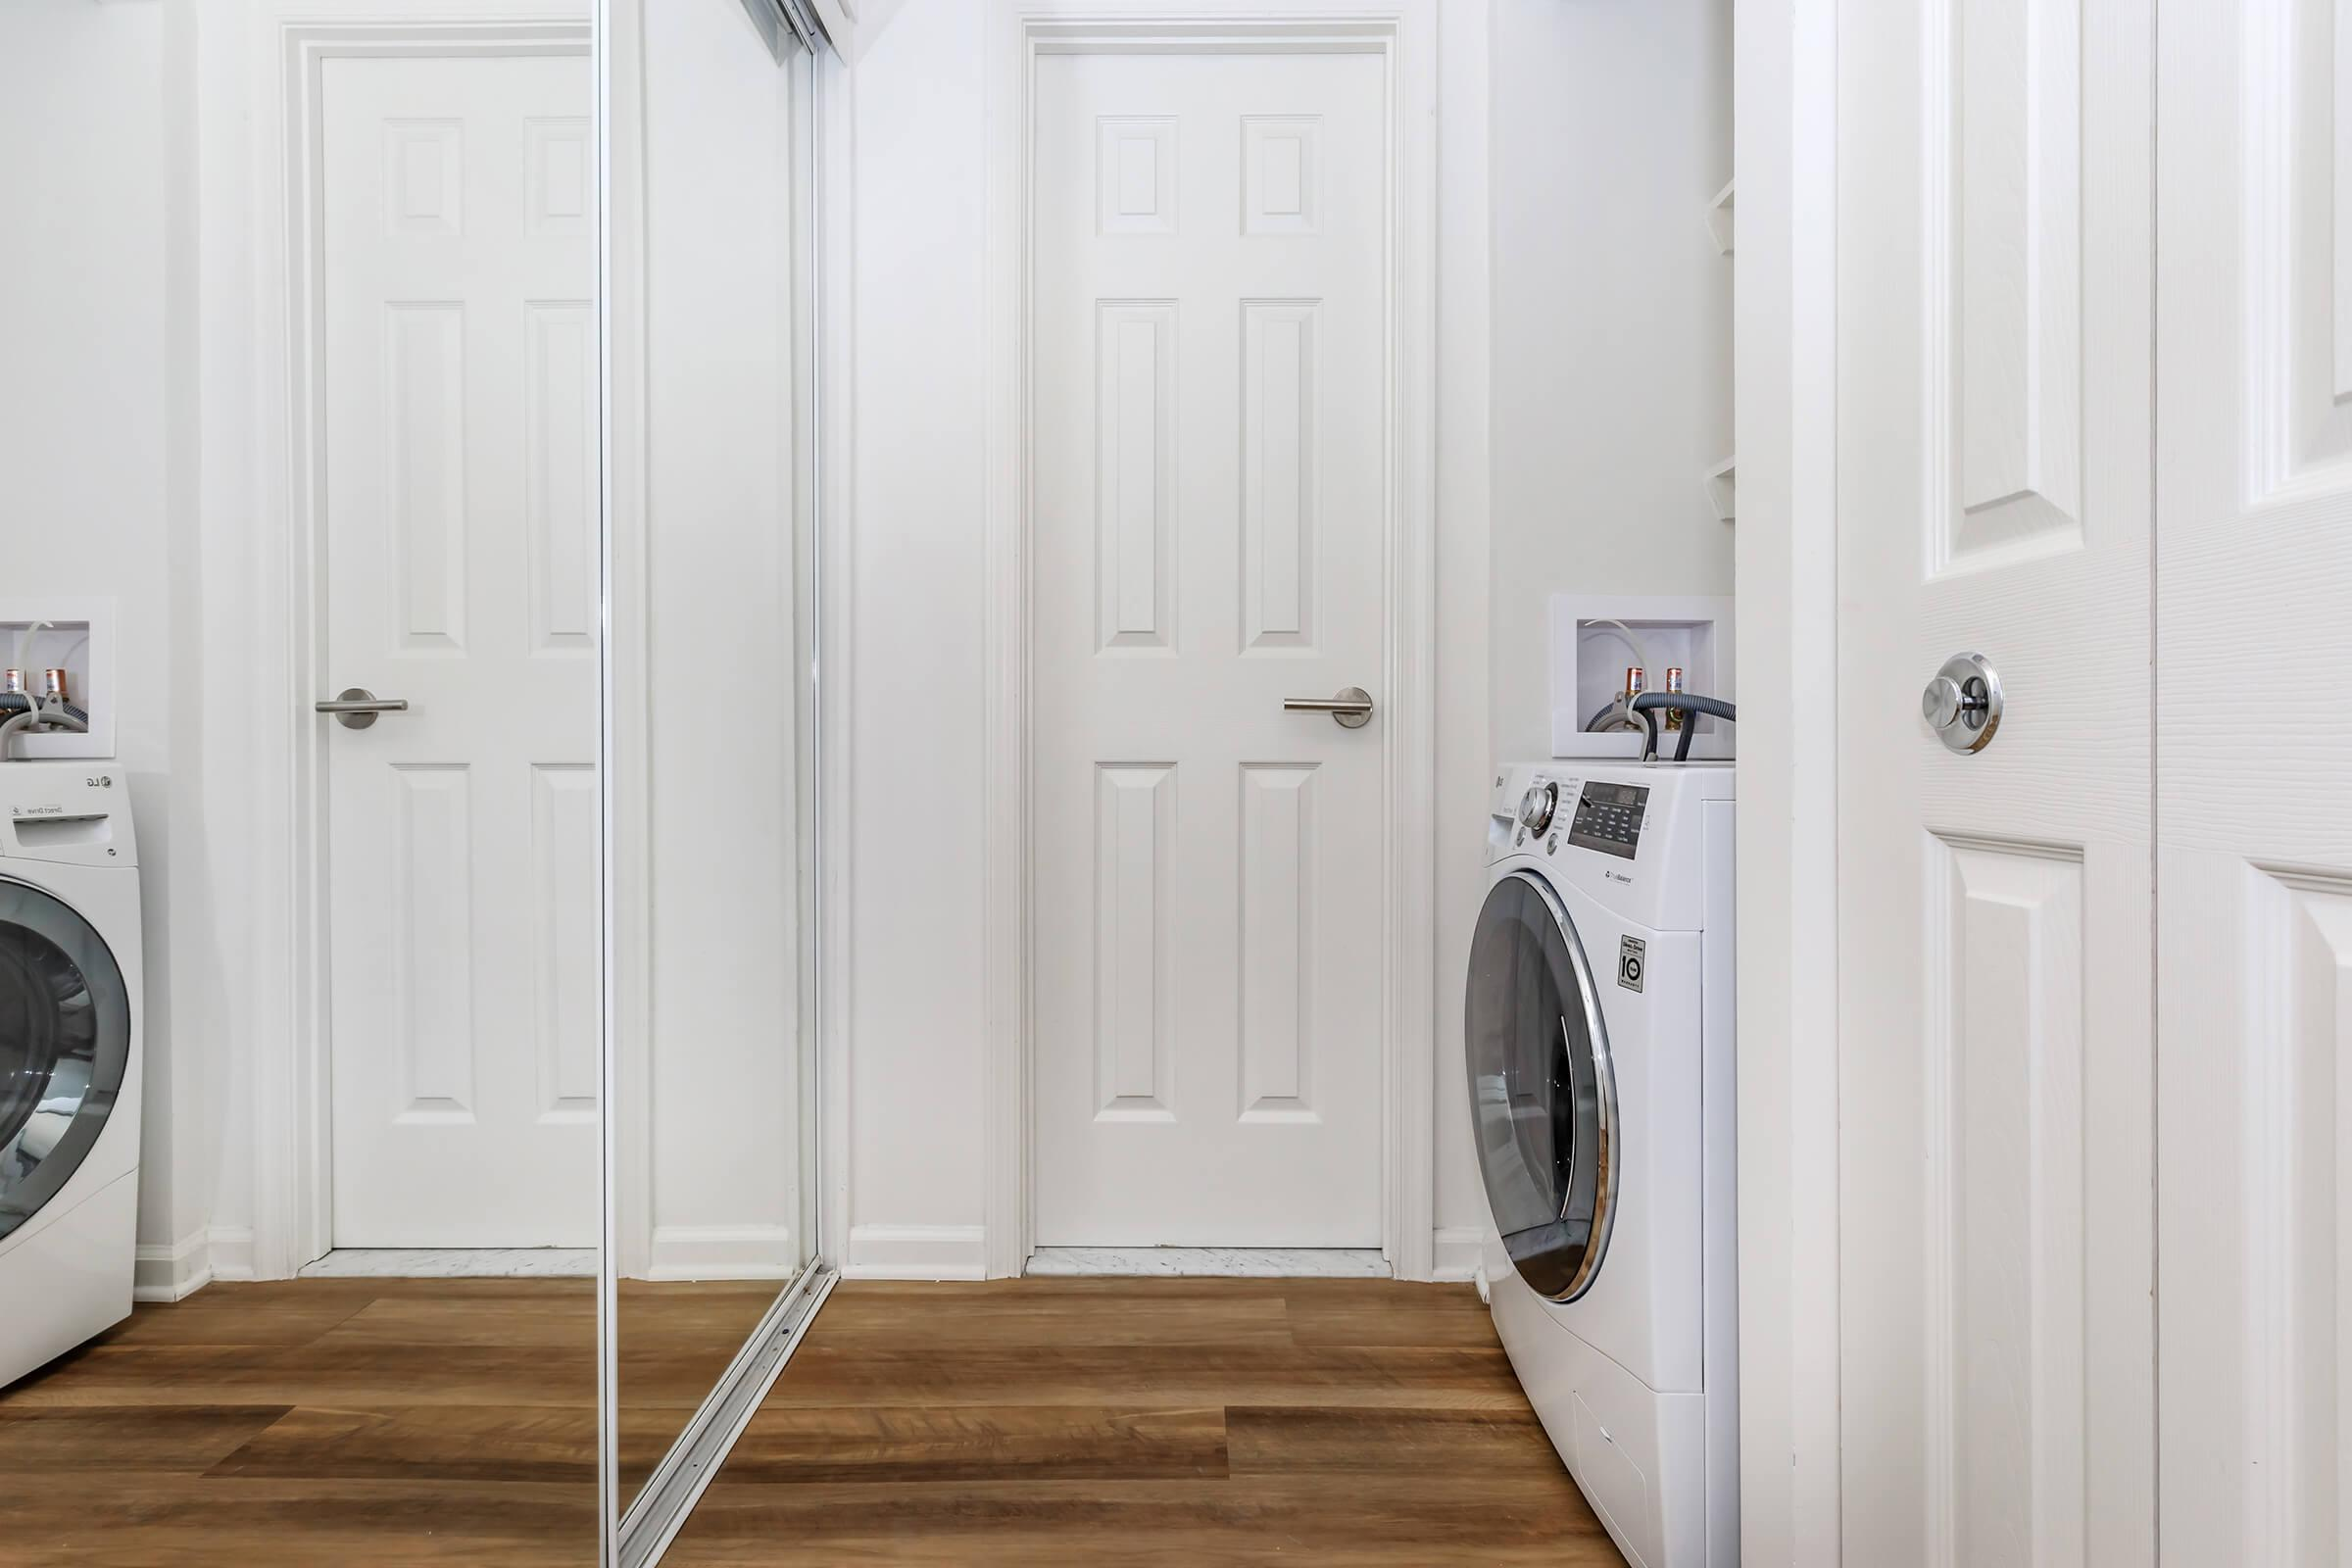 Laundry Room at Whitestoneat Landmark in Alexandria R